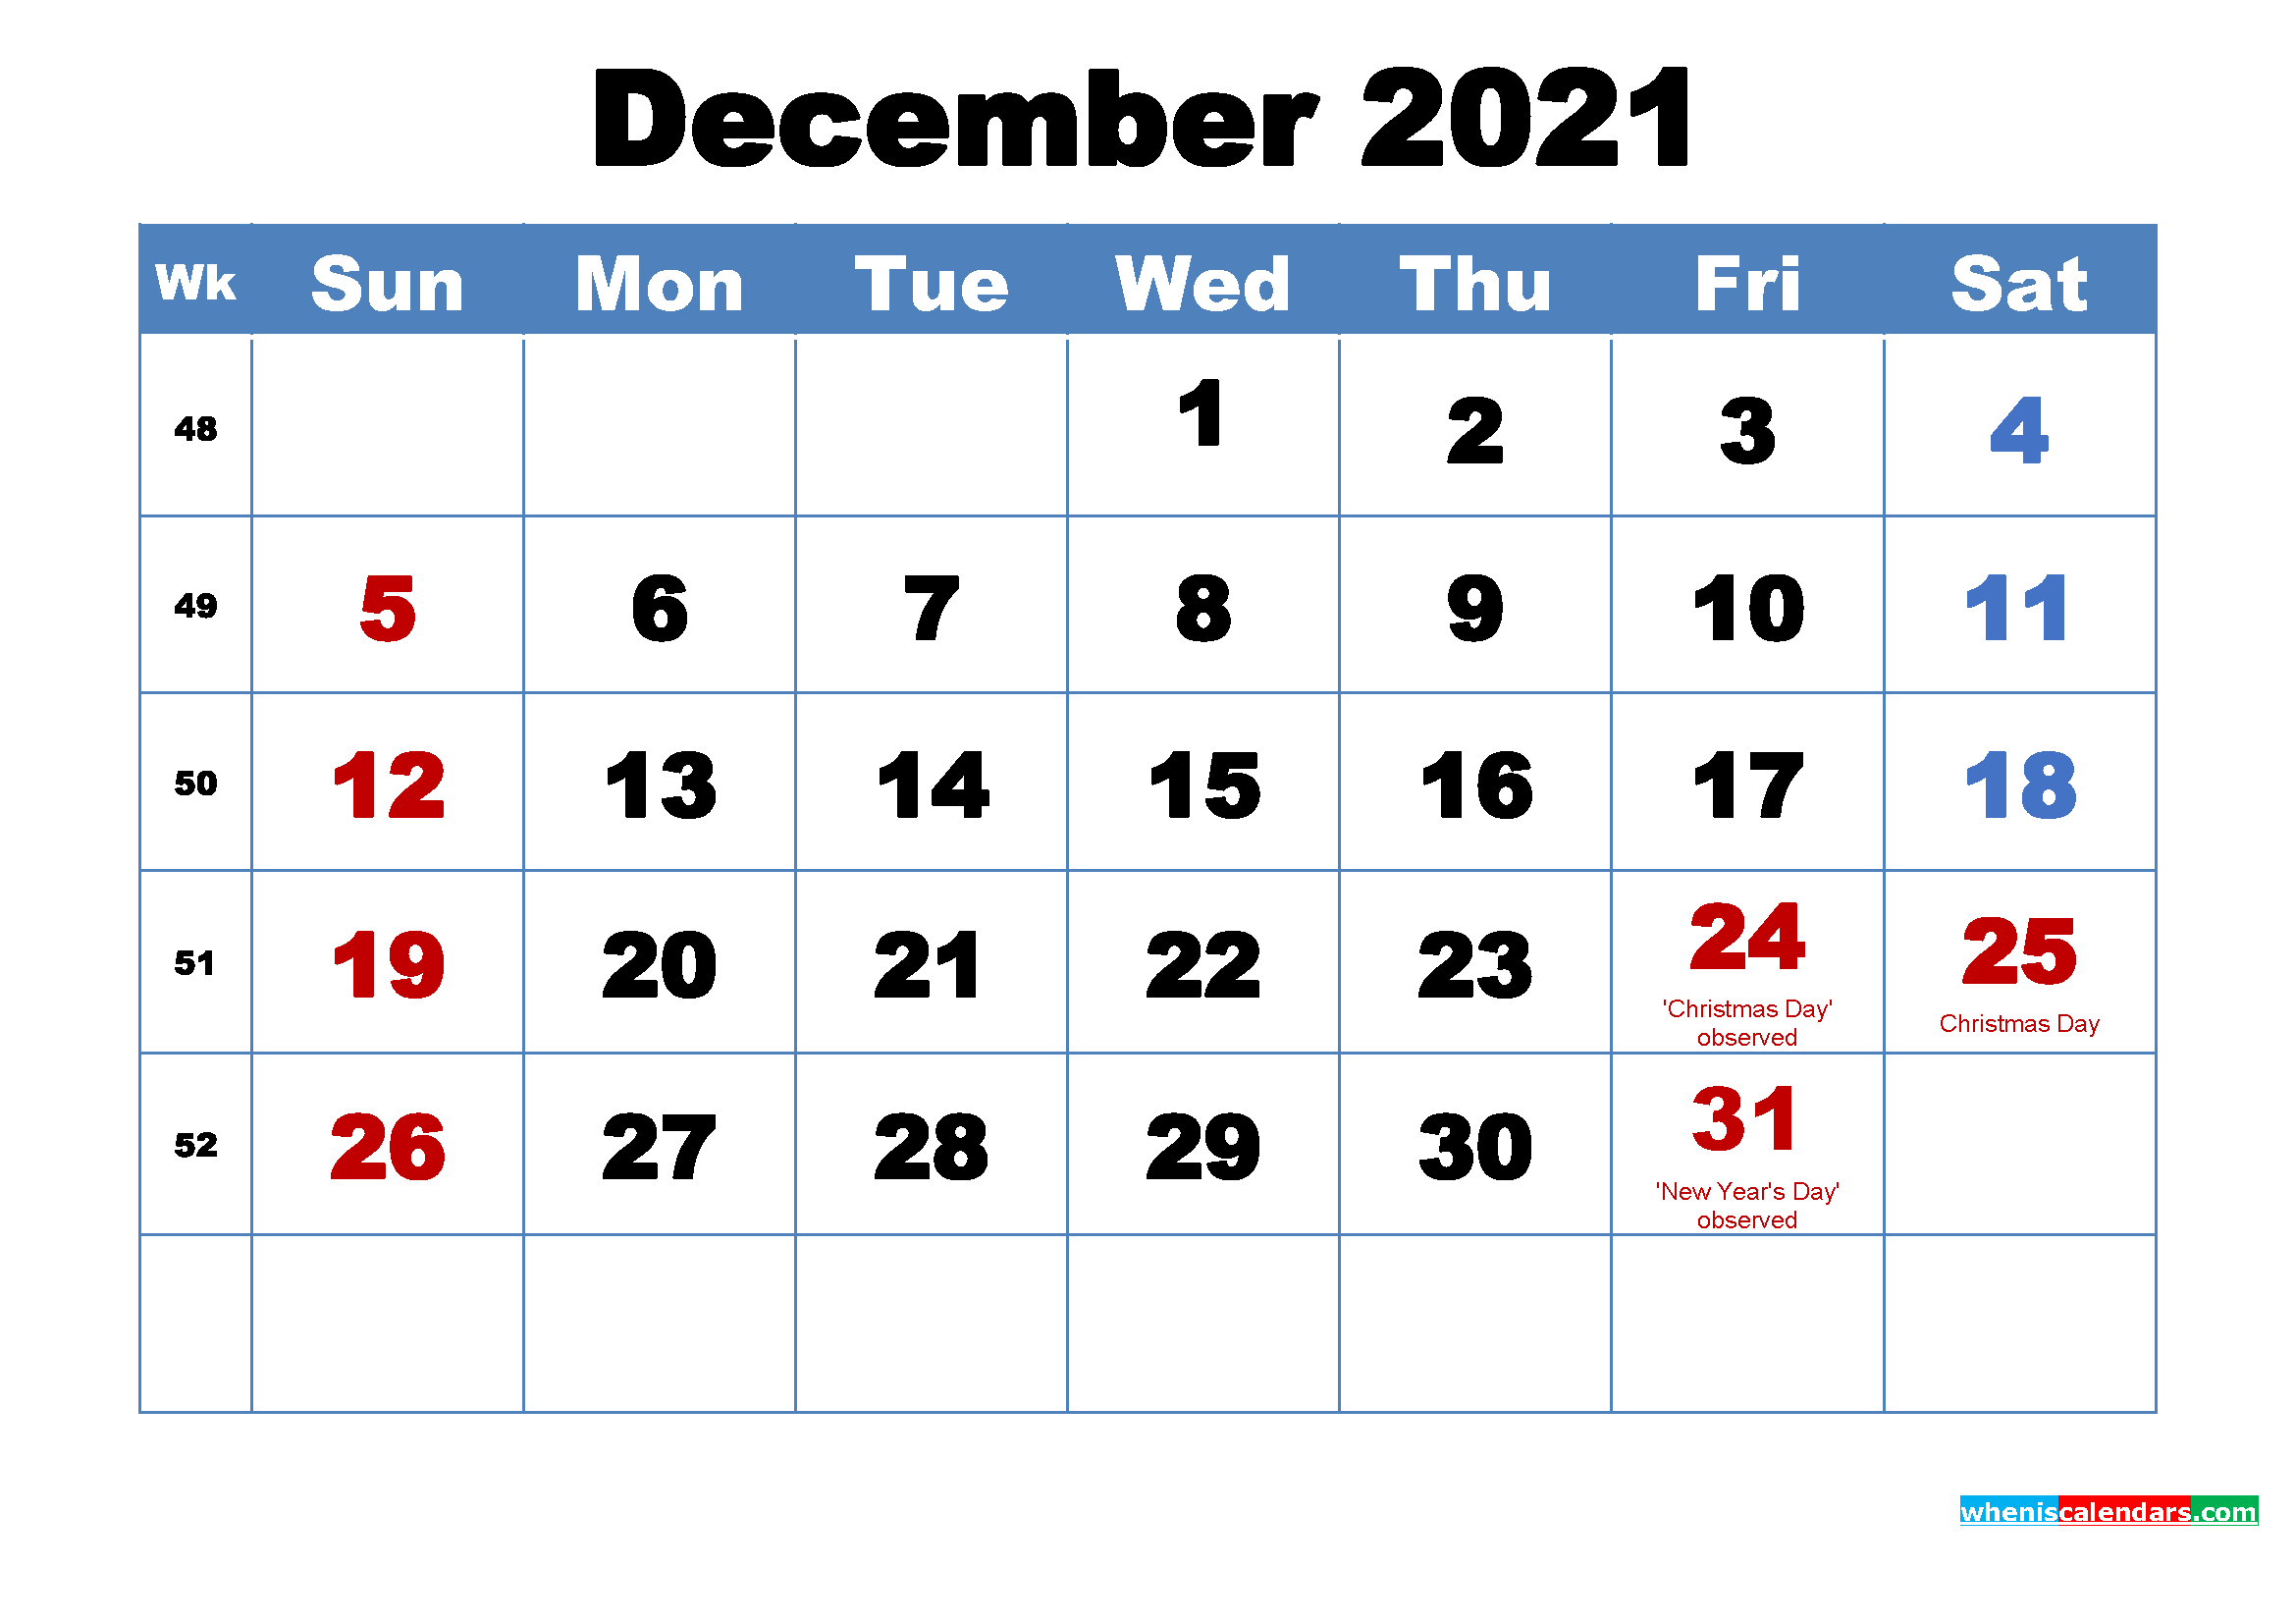 December 2021 Calendar With Holidays Printable December 2021 Calendar with Holidays – Free Printable